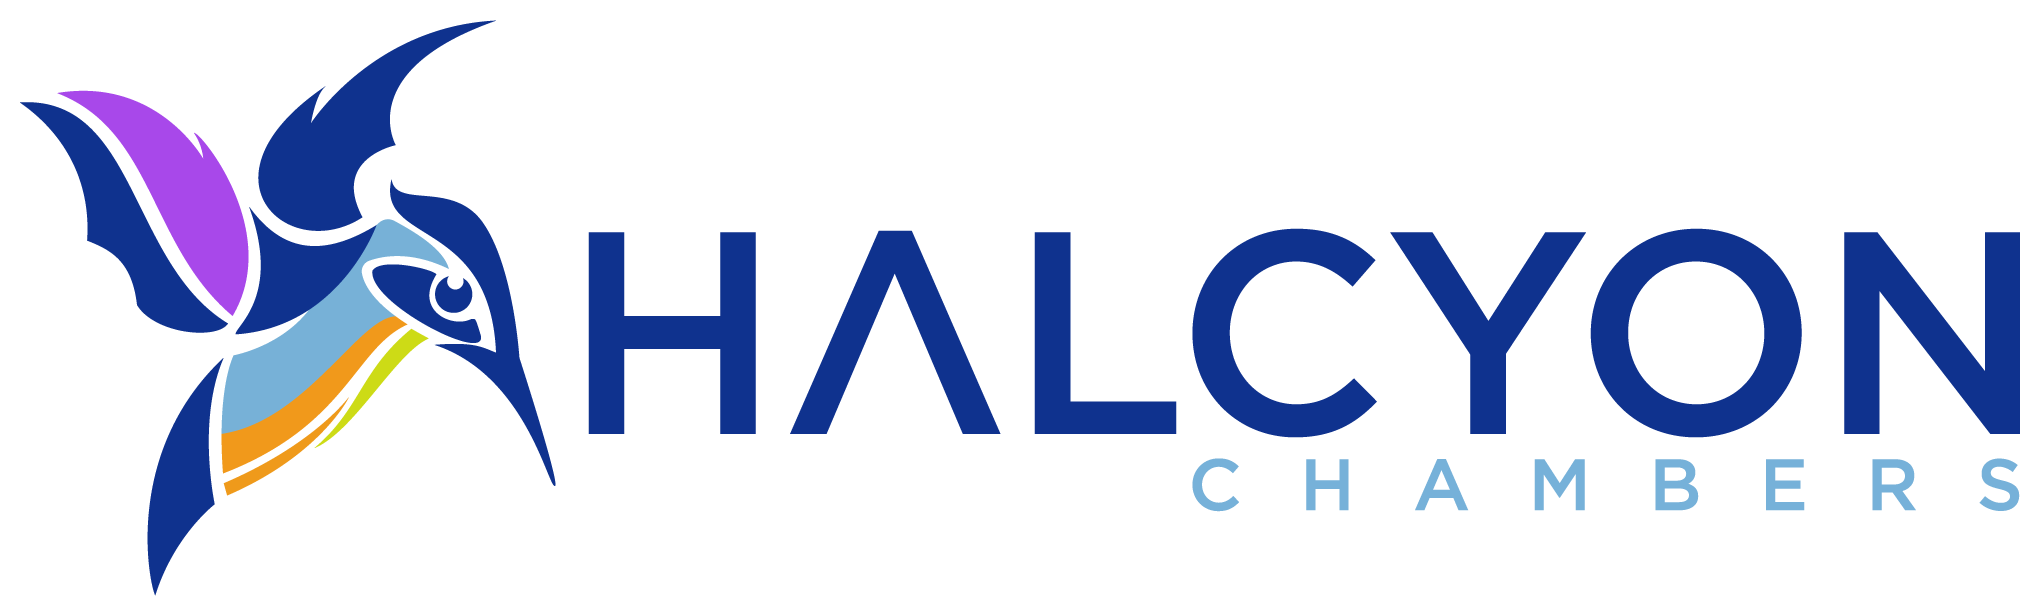 Halcyon Chambers